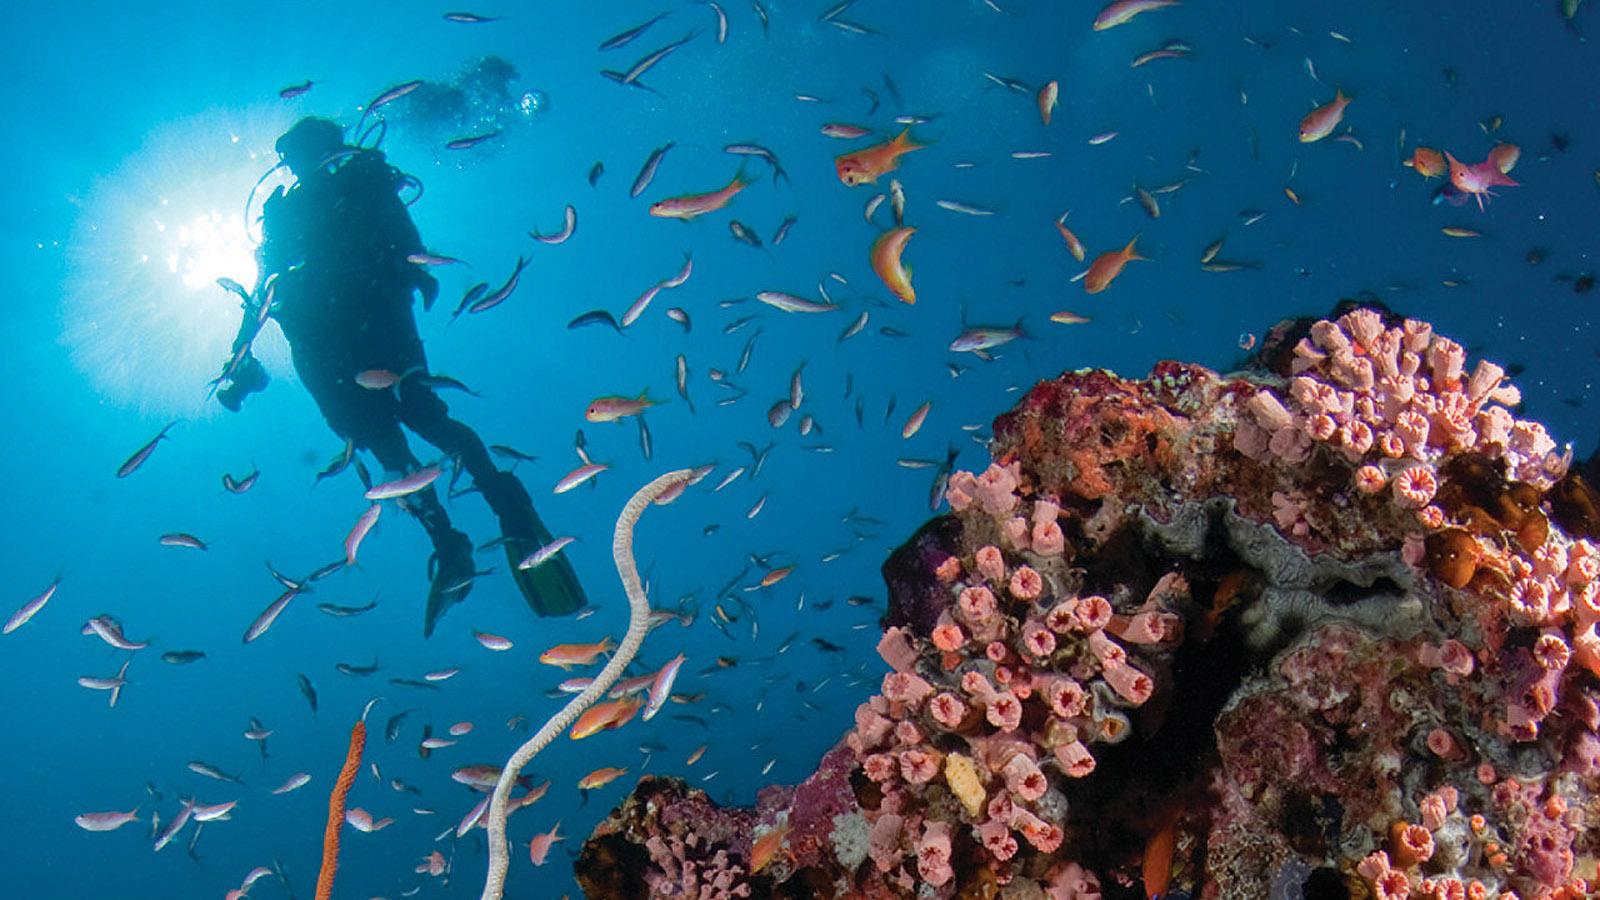 Mlg Hd Wallpaper Maldives Diving Scuba Diving Four Seasons Landaa Giraavaru